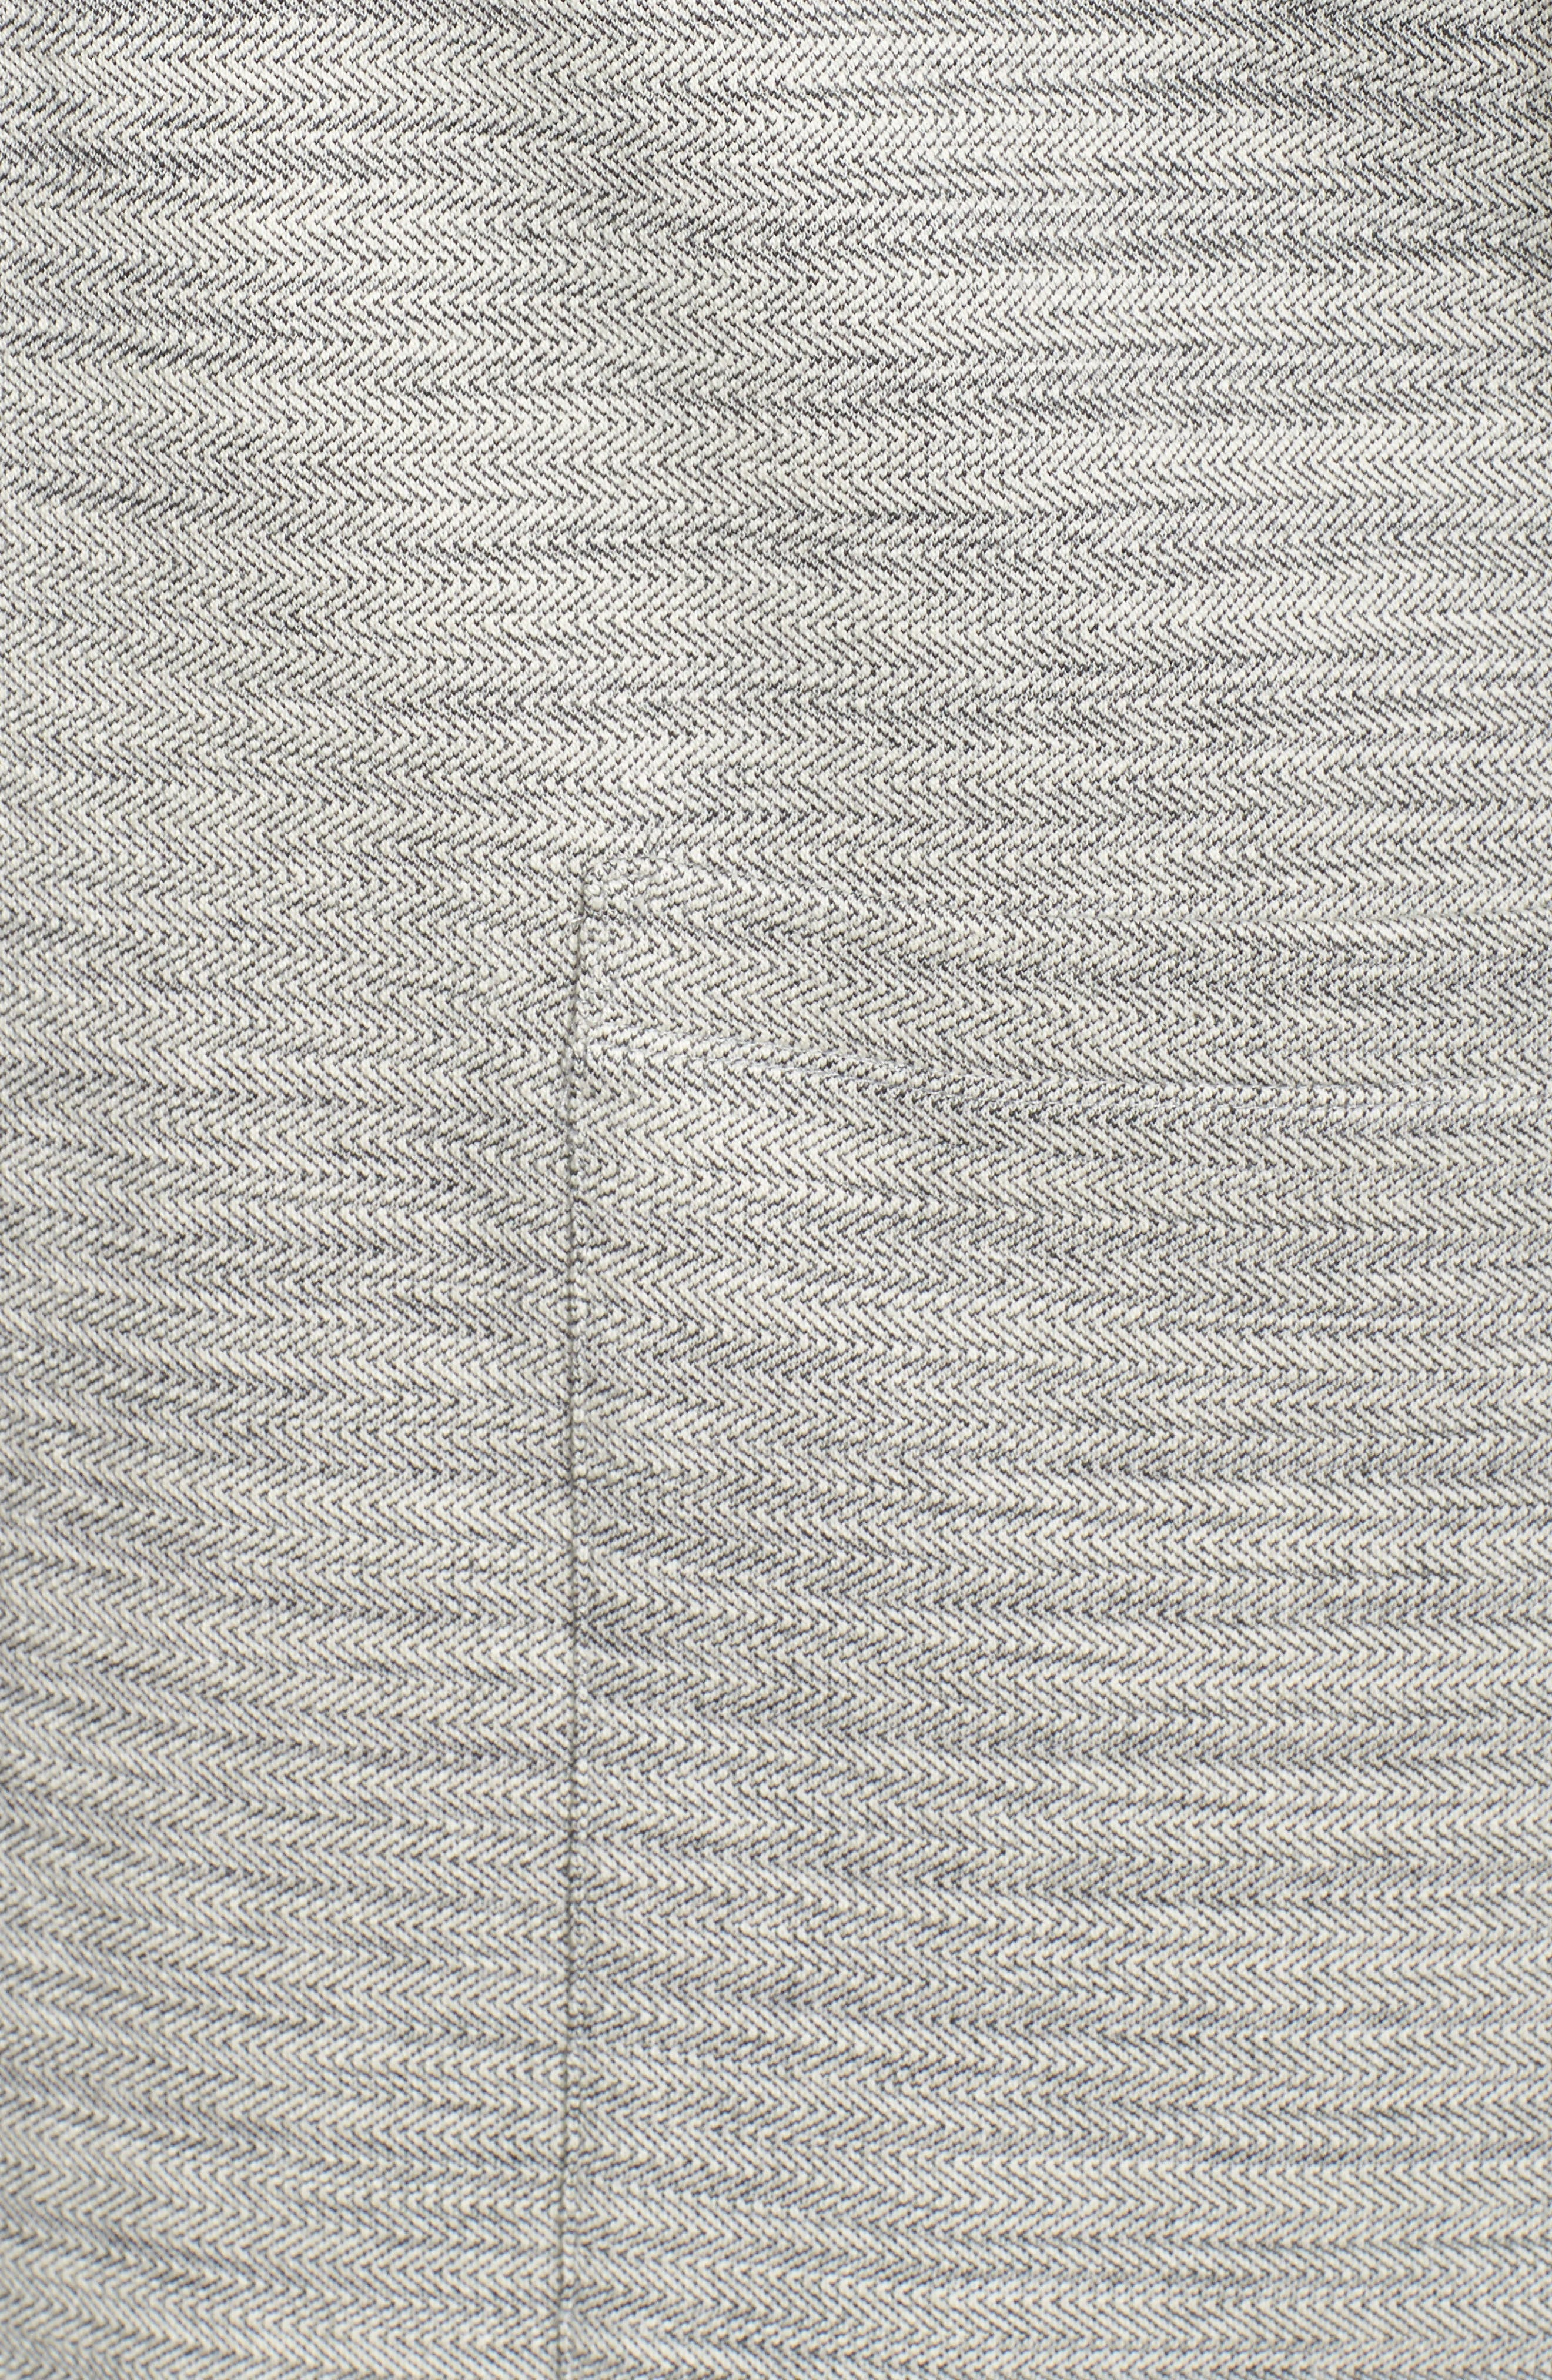 Cotton Blend Tweed Jacket,                             Alternate thumbnail 5, color,                             Dark Pearl